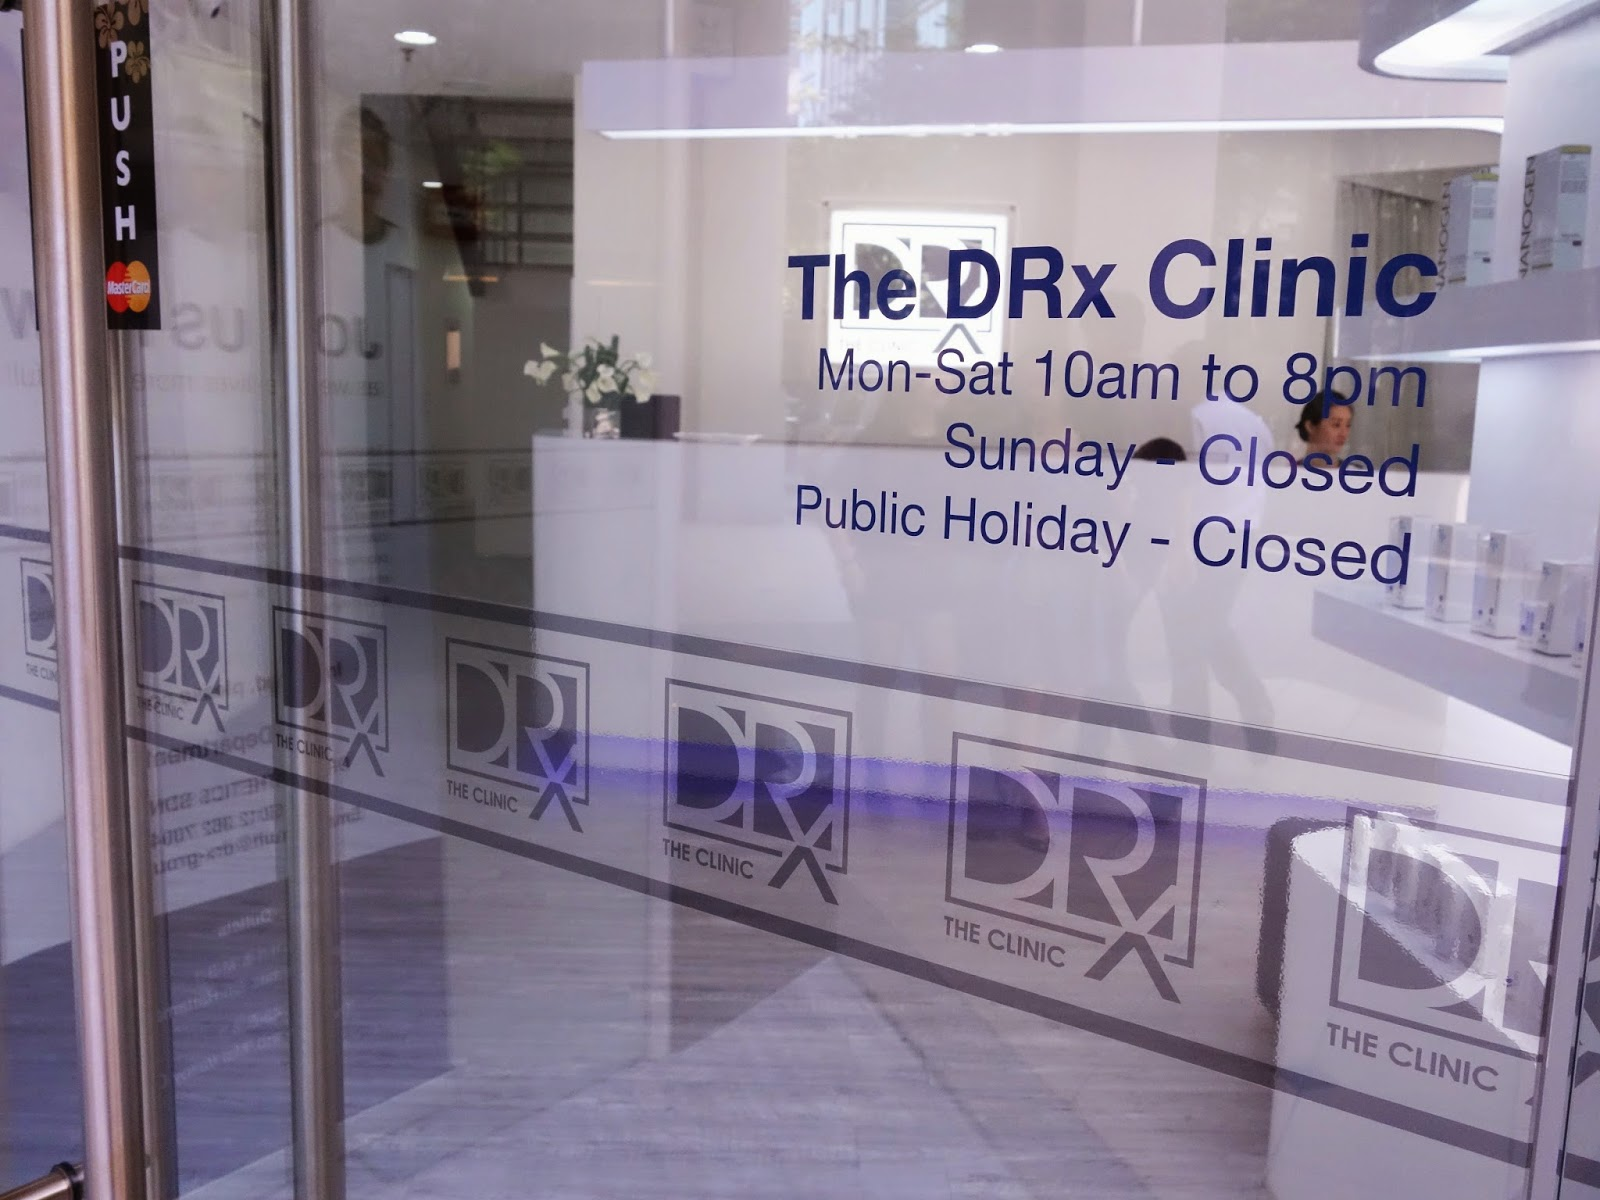 Careentan com: DRx Clinic Malaysia: First Skin Consultation